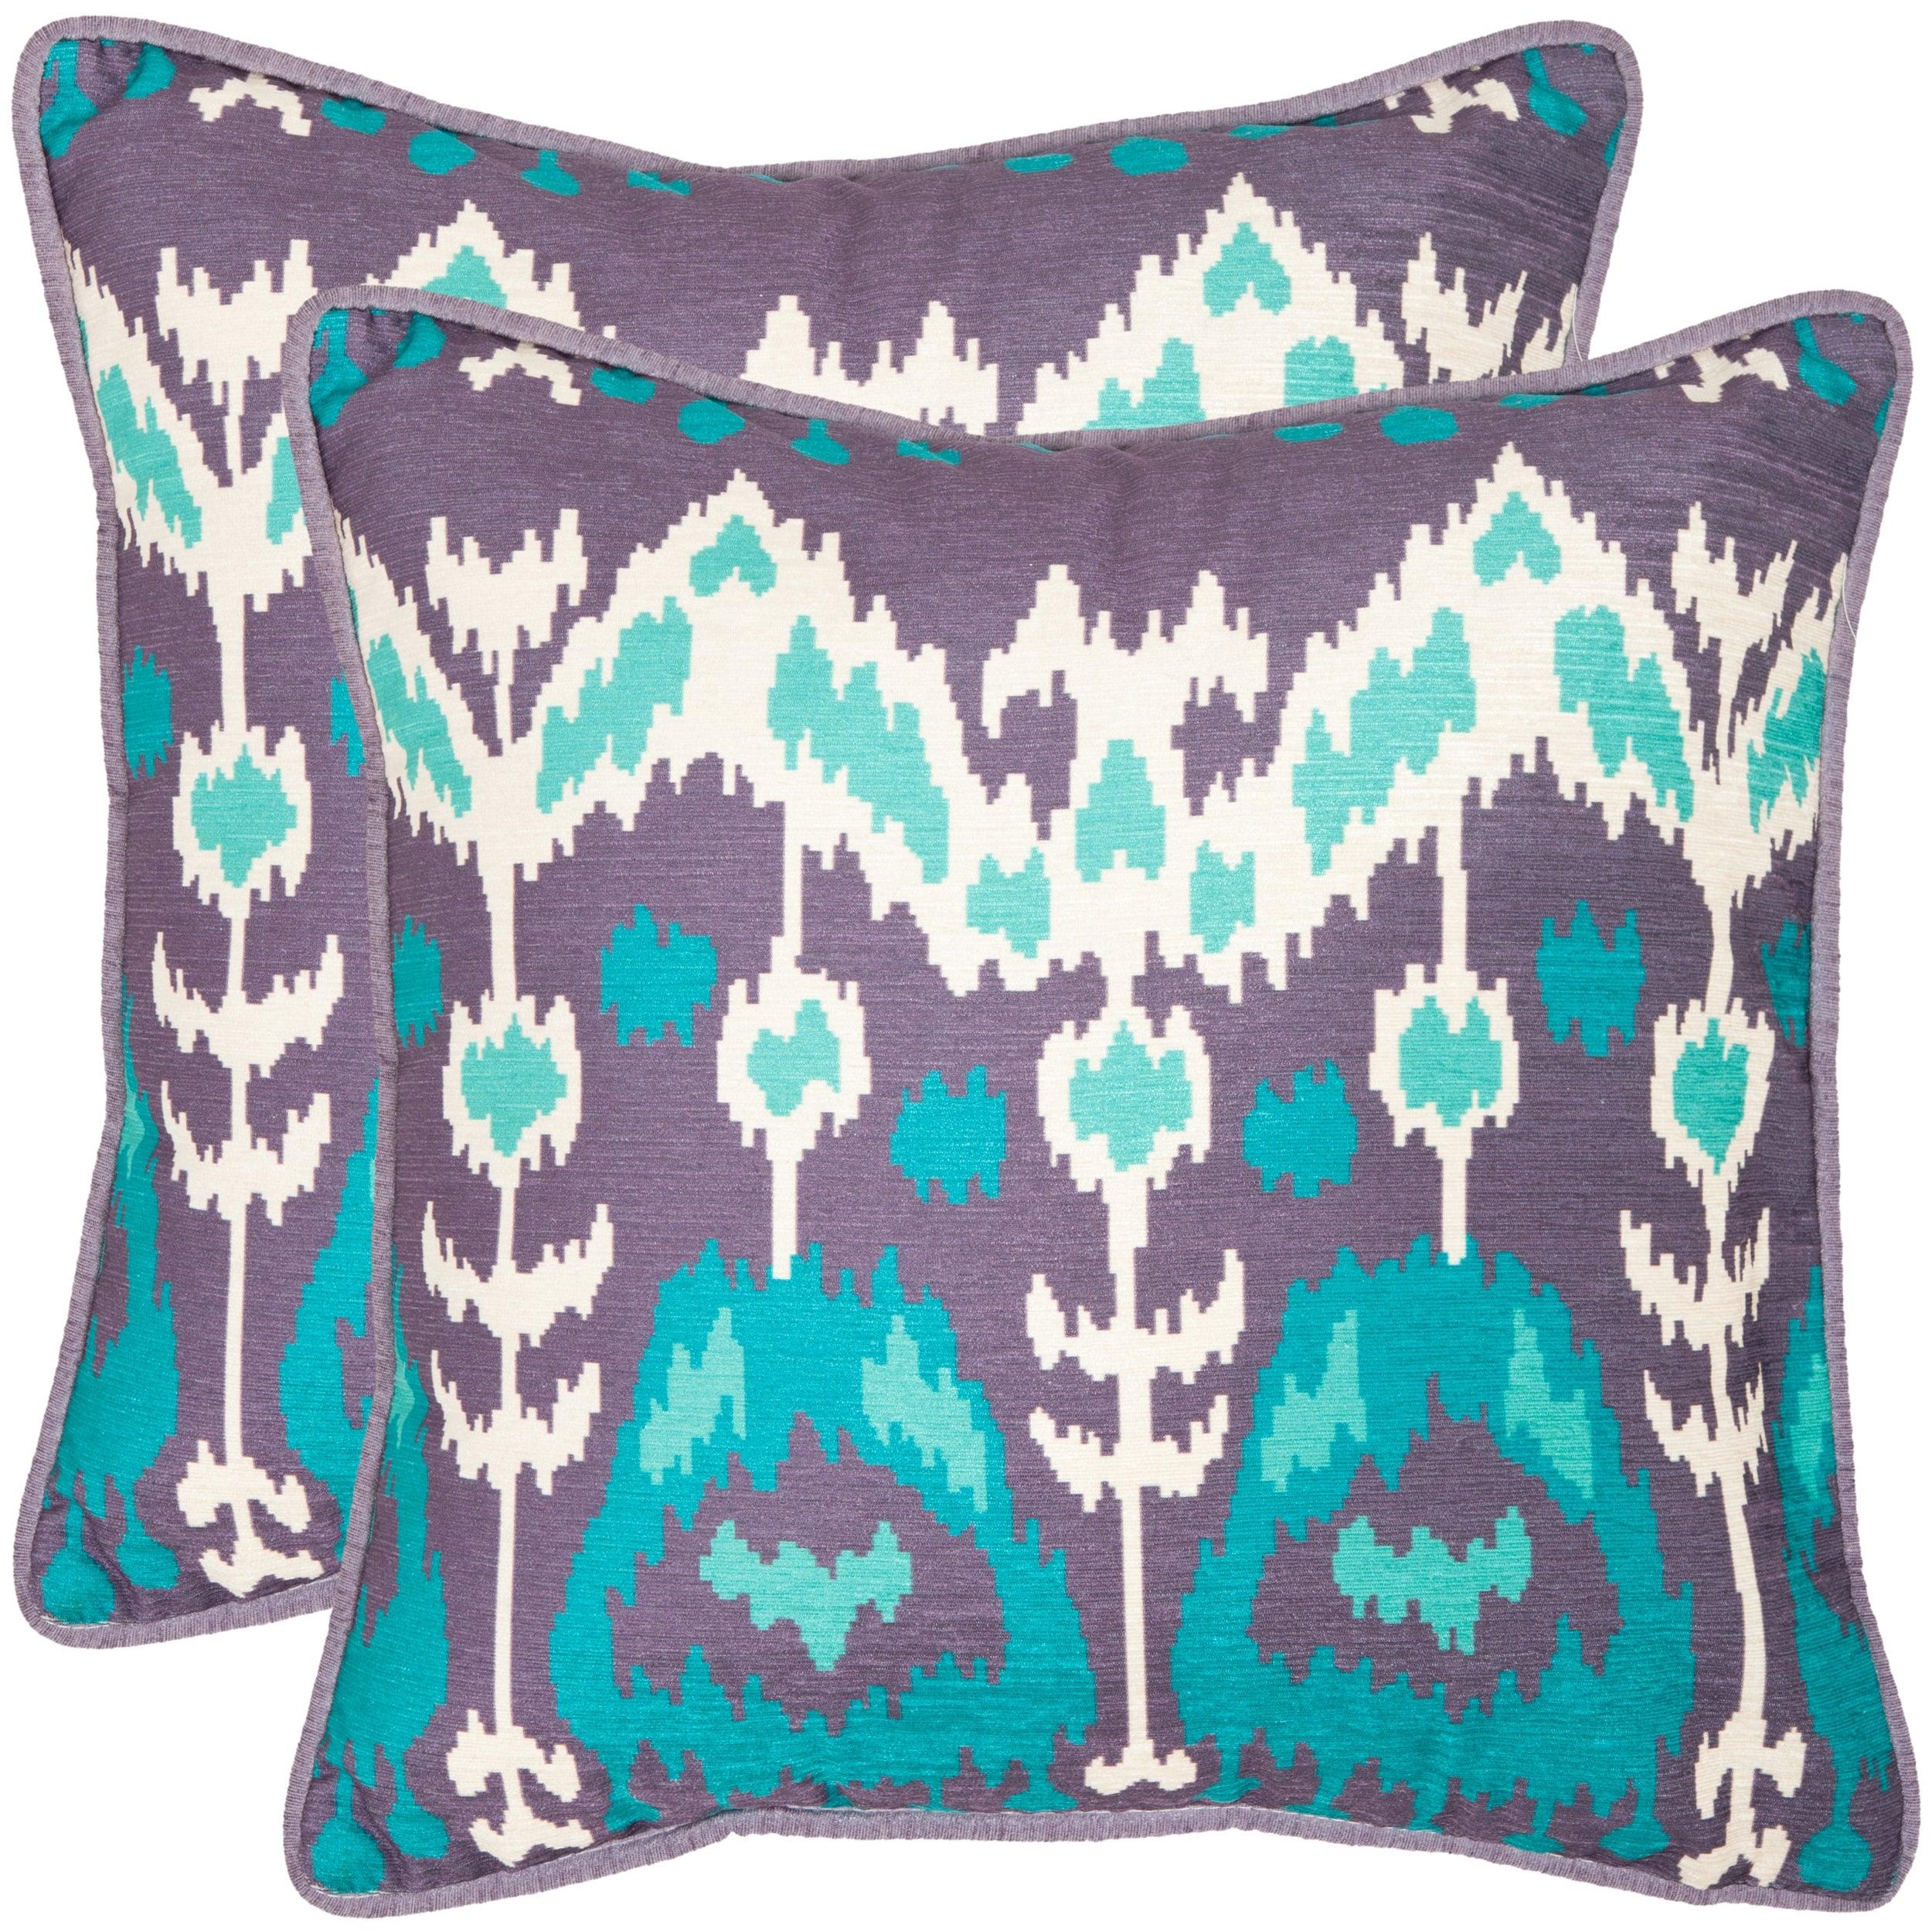 Safavieh Manhattan 22 Inch Lavander Aqua Blue Decorative Pillows Set Of 2 Overstock 7576240